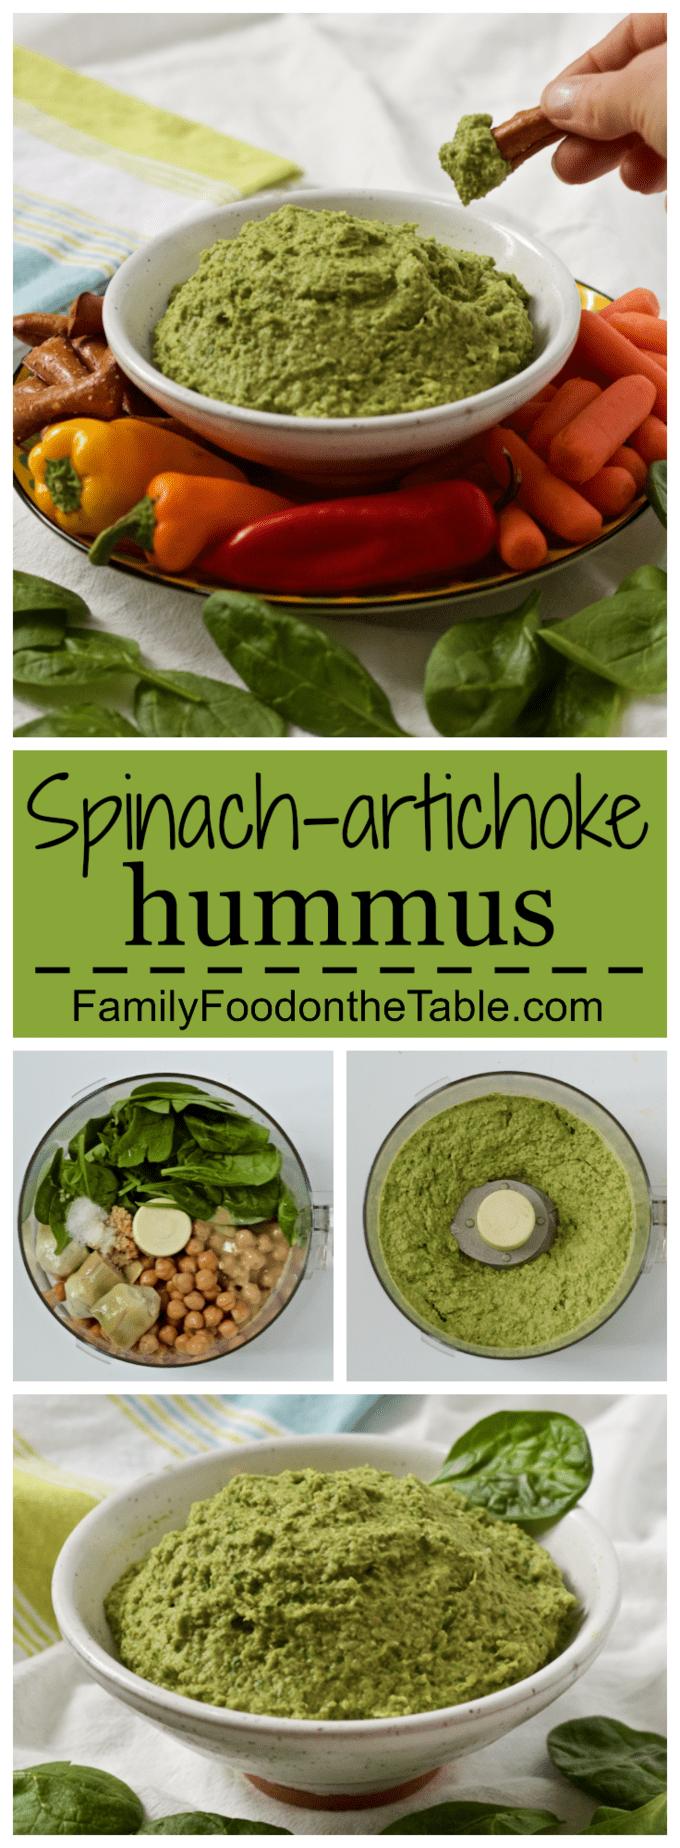 Spinach artichoke hummus collage